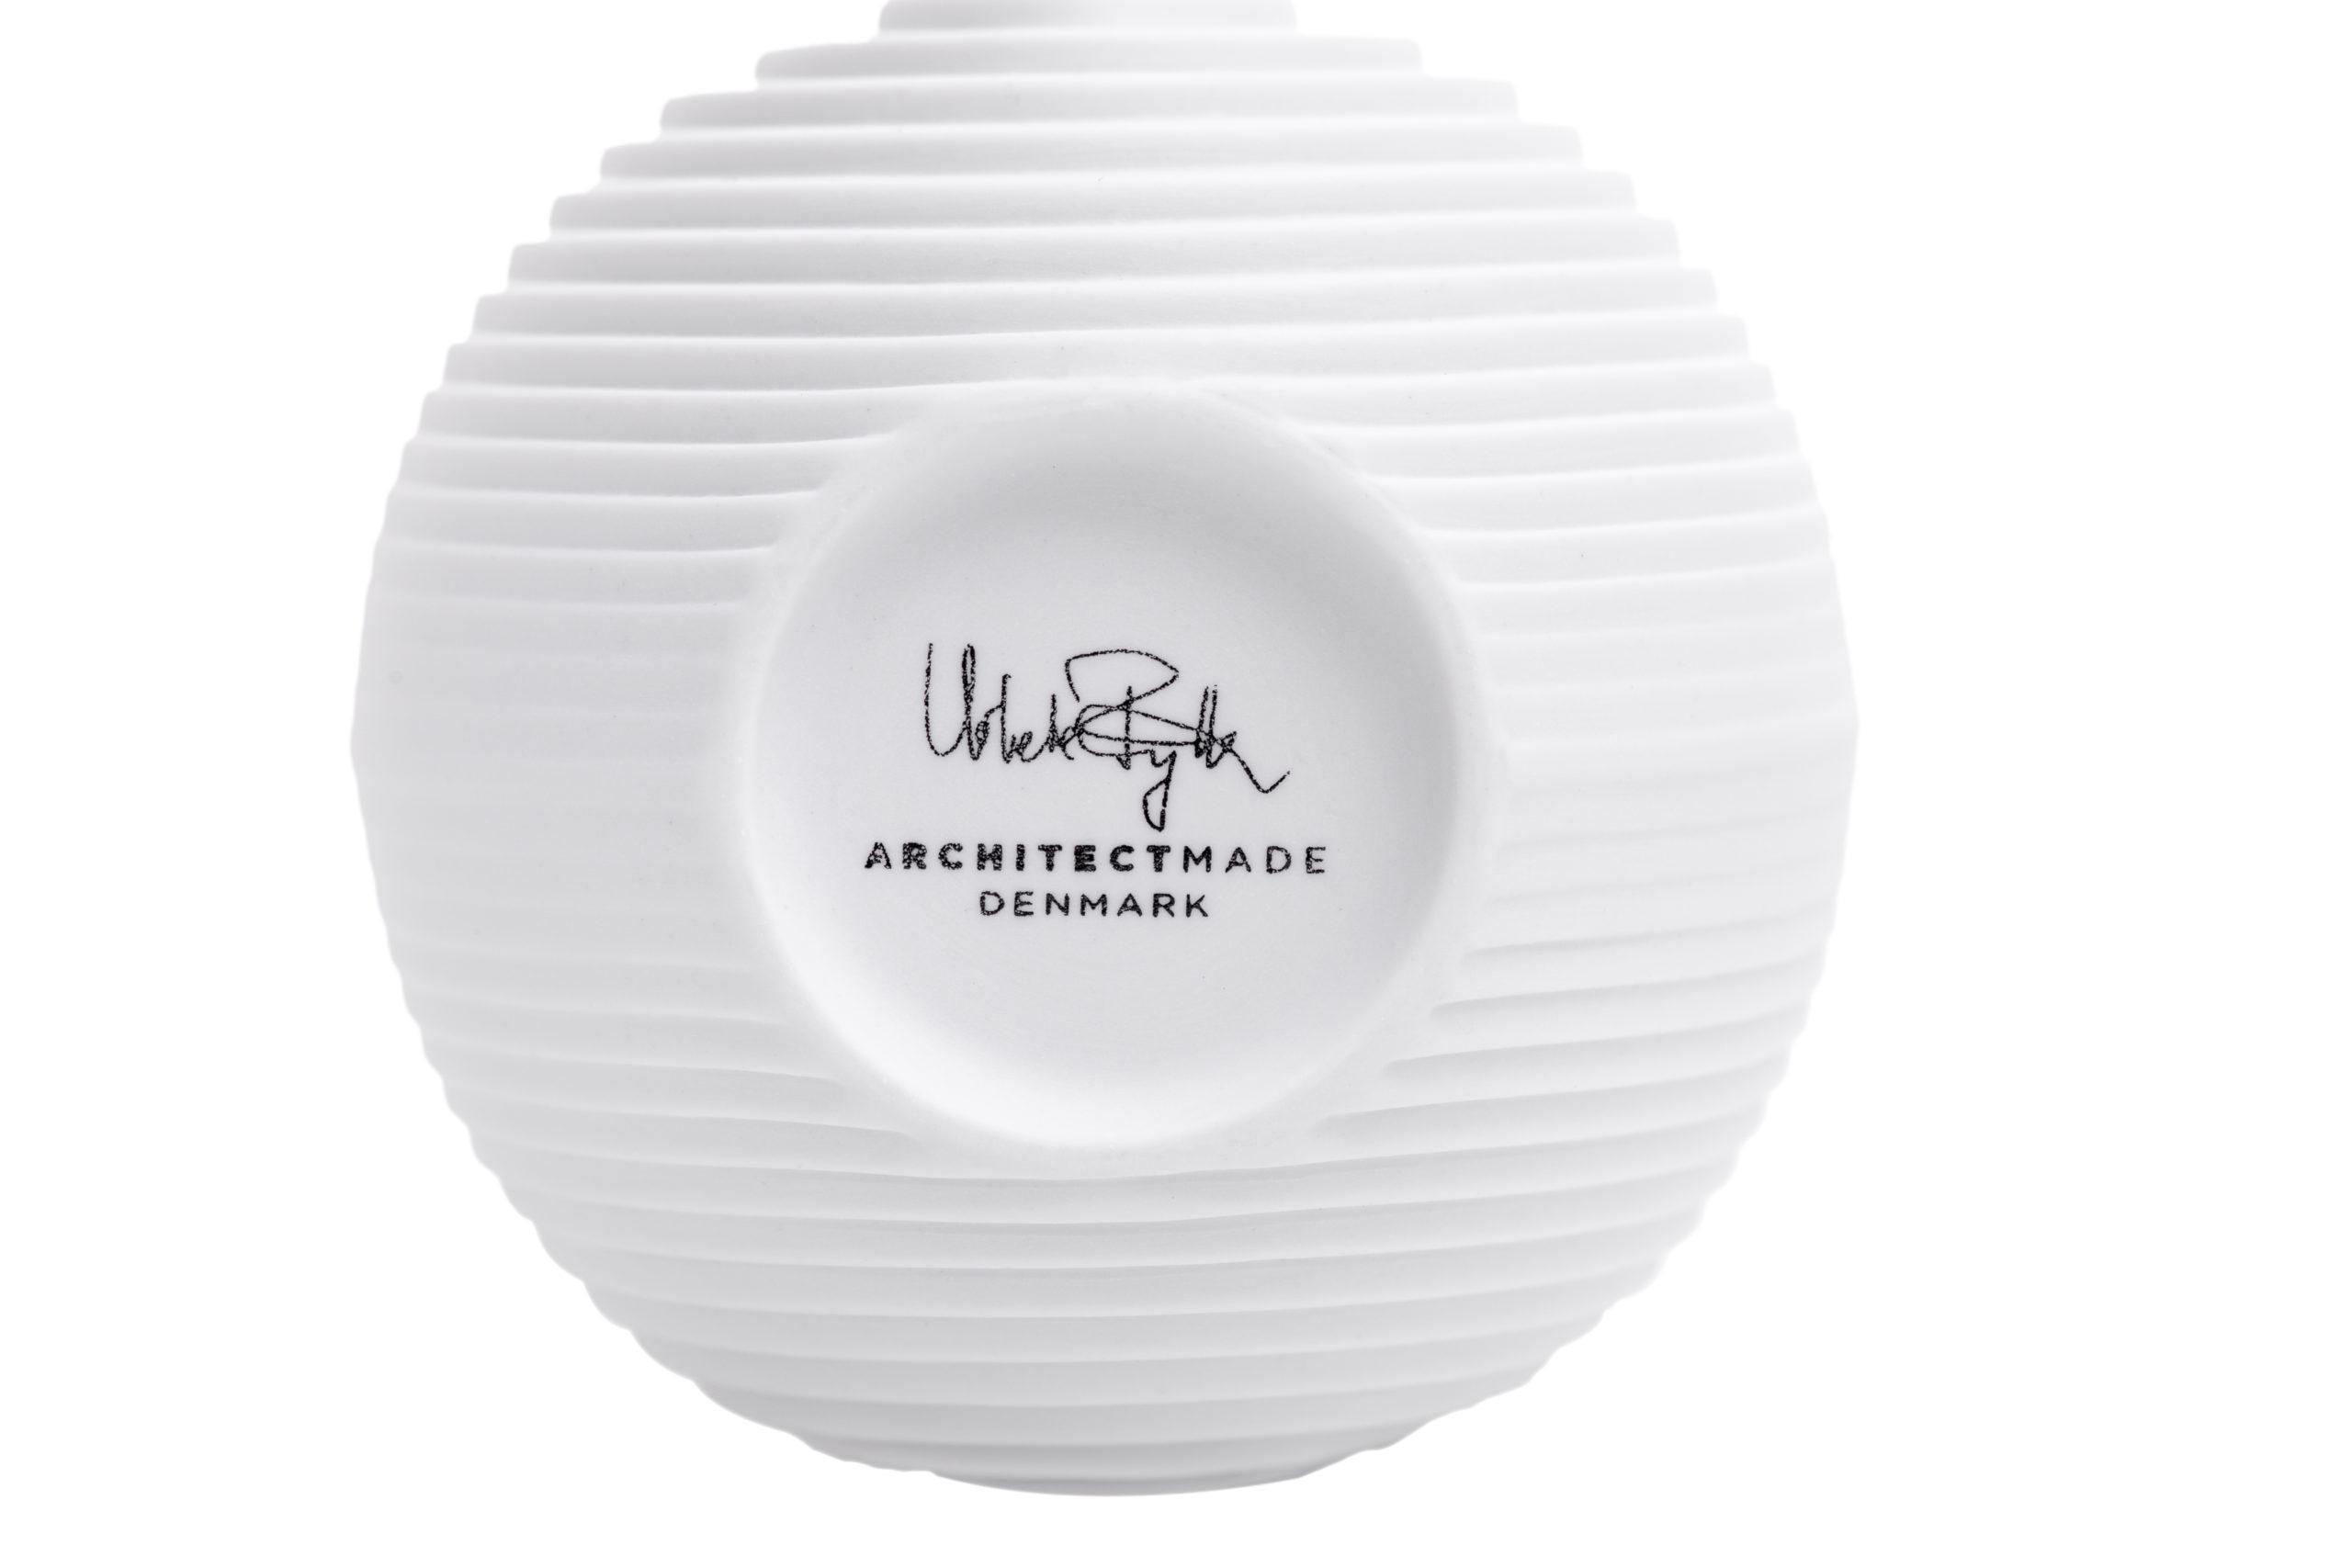 Architectmade-Flow-Porcelain-Vibeke-Rytter-3